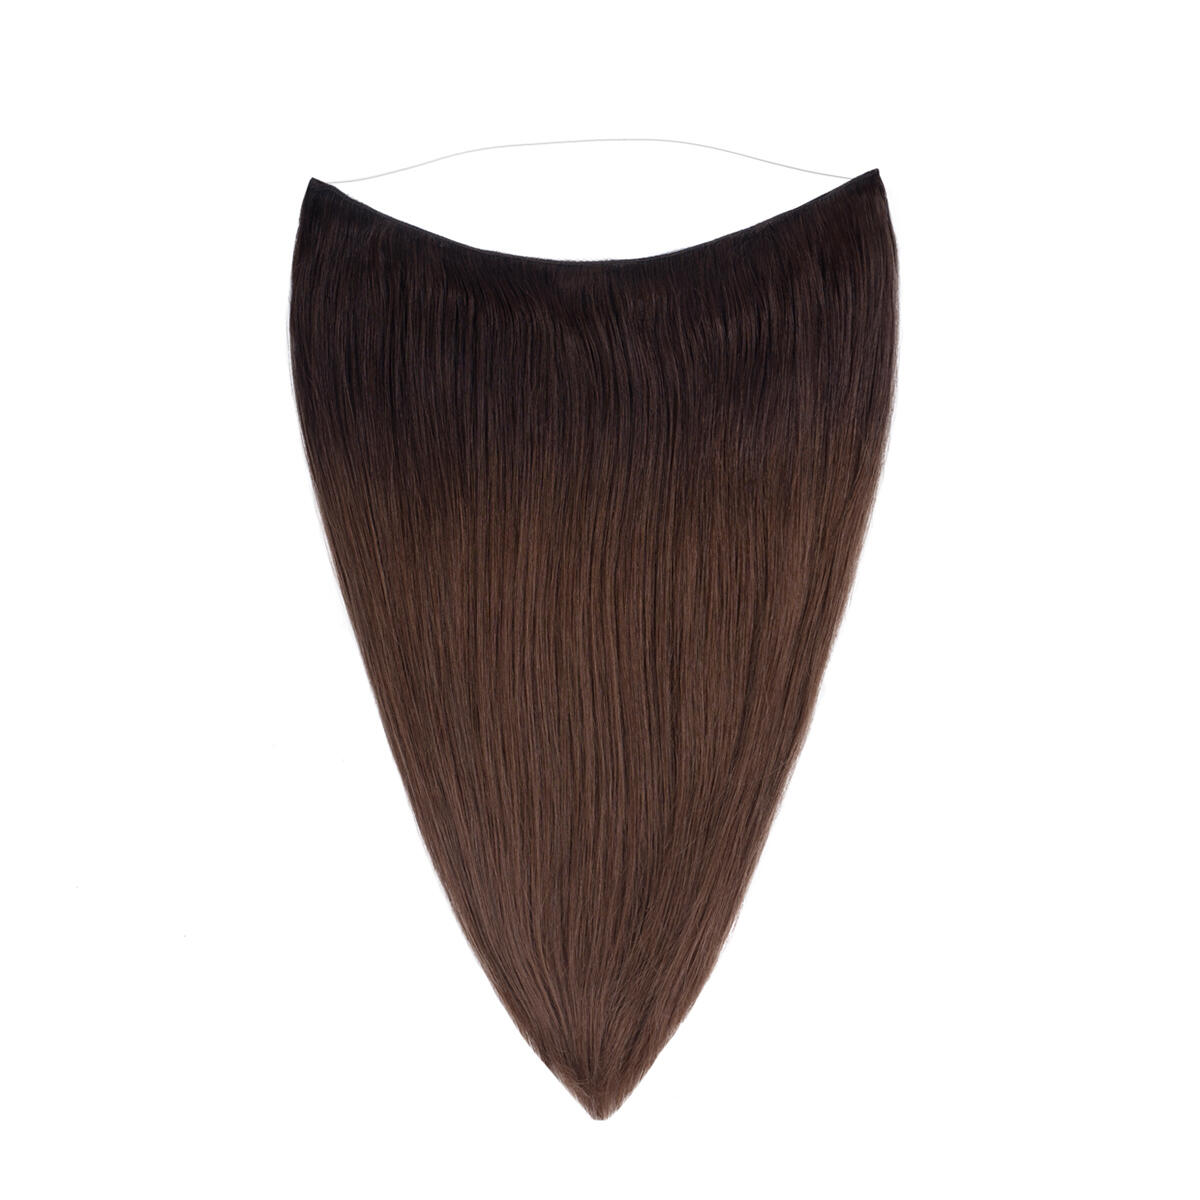 Hairband Original O2.3/5.0 Chocolate Brown Ombre 45 cm